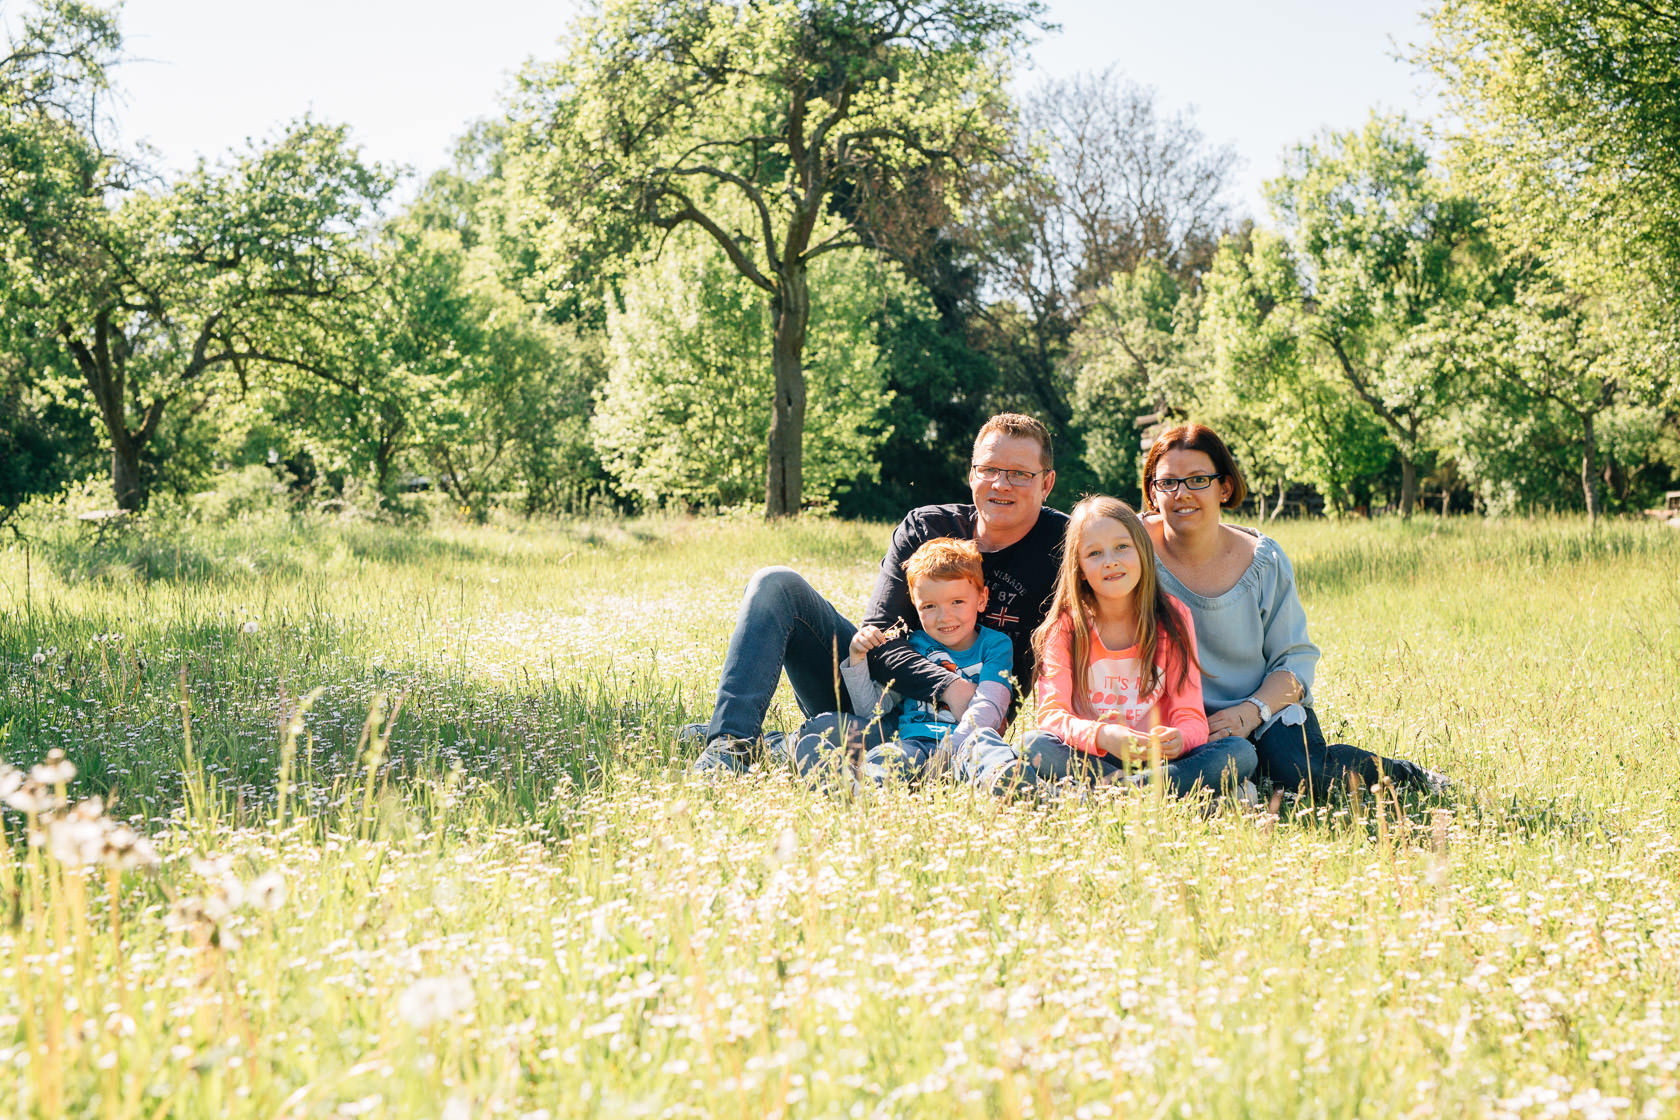 Familienfotos in der Natur Familienfotograf Karlsruhe Sommerfotos Pusteblumen Familienfotografie Fotograf